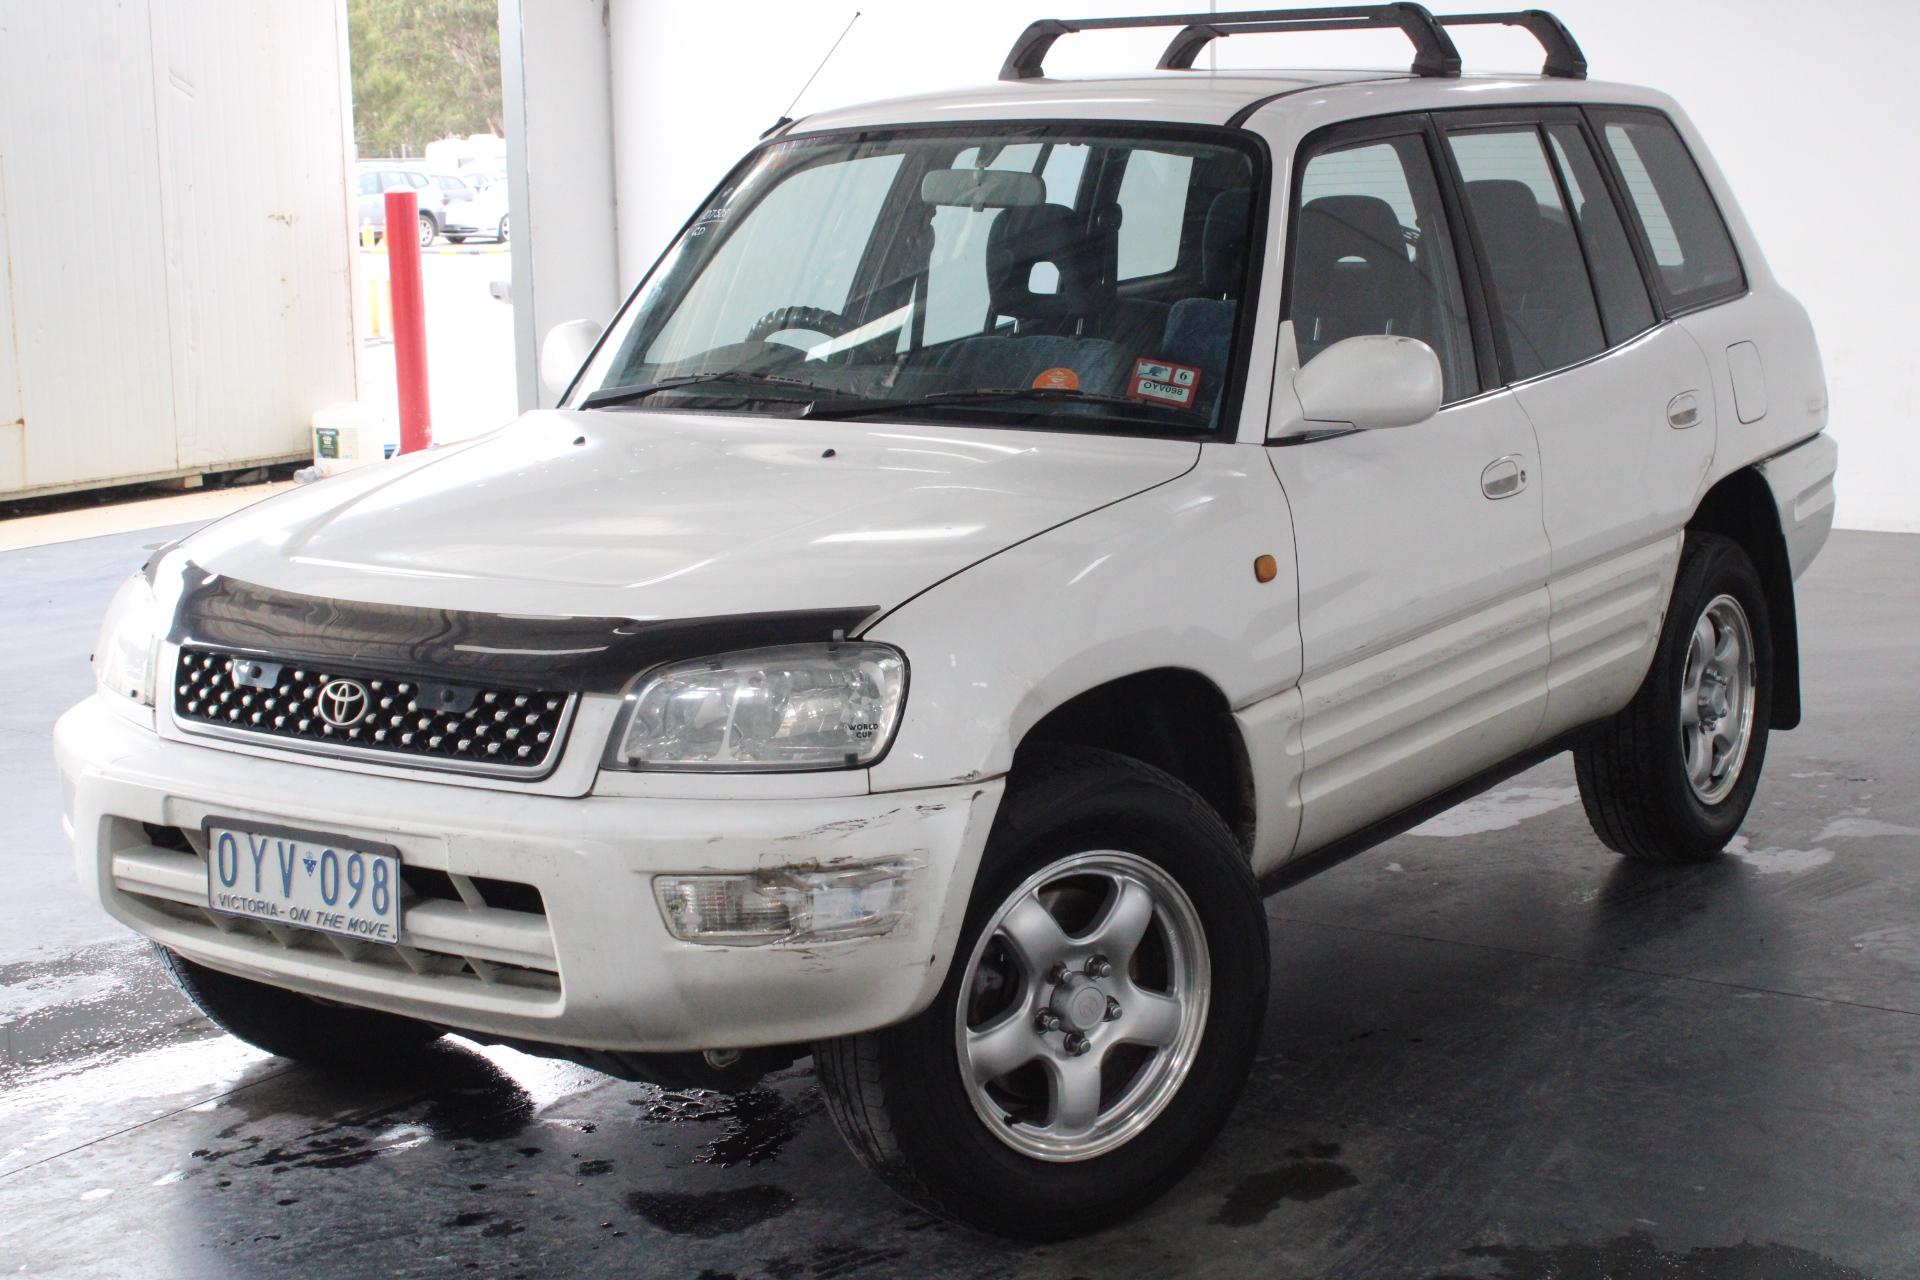 1998 Toyota Rav 4 Cruiser (4x4) SXA11R Automatic Wagon